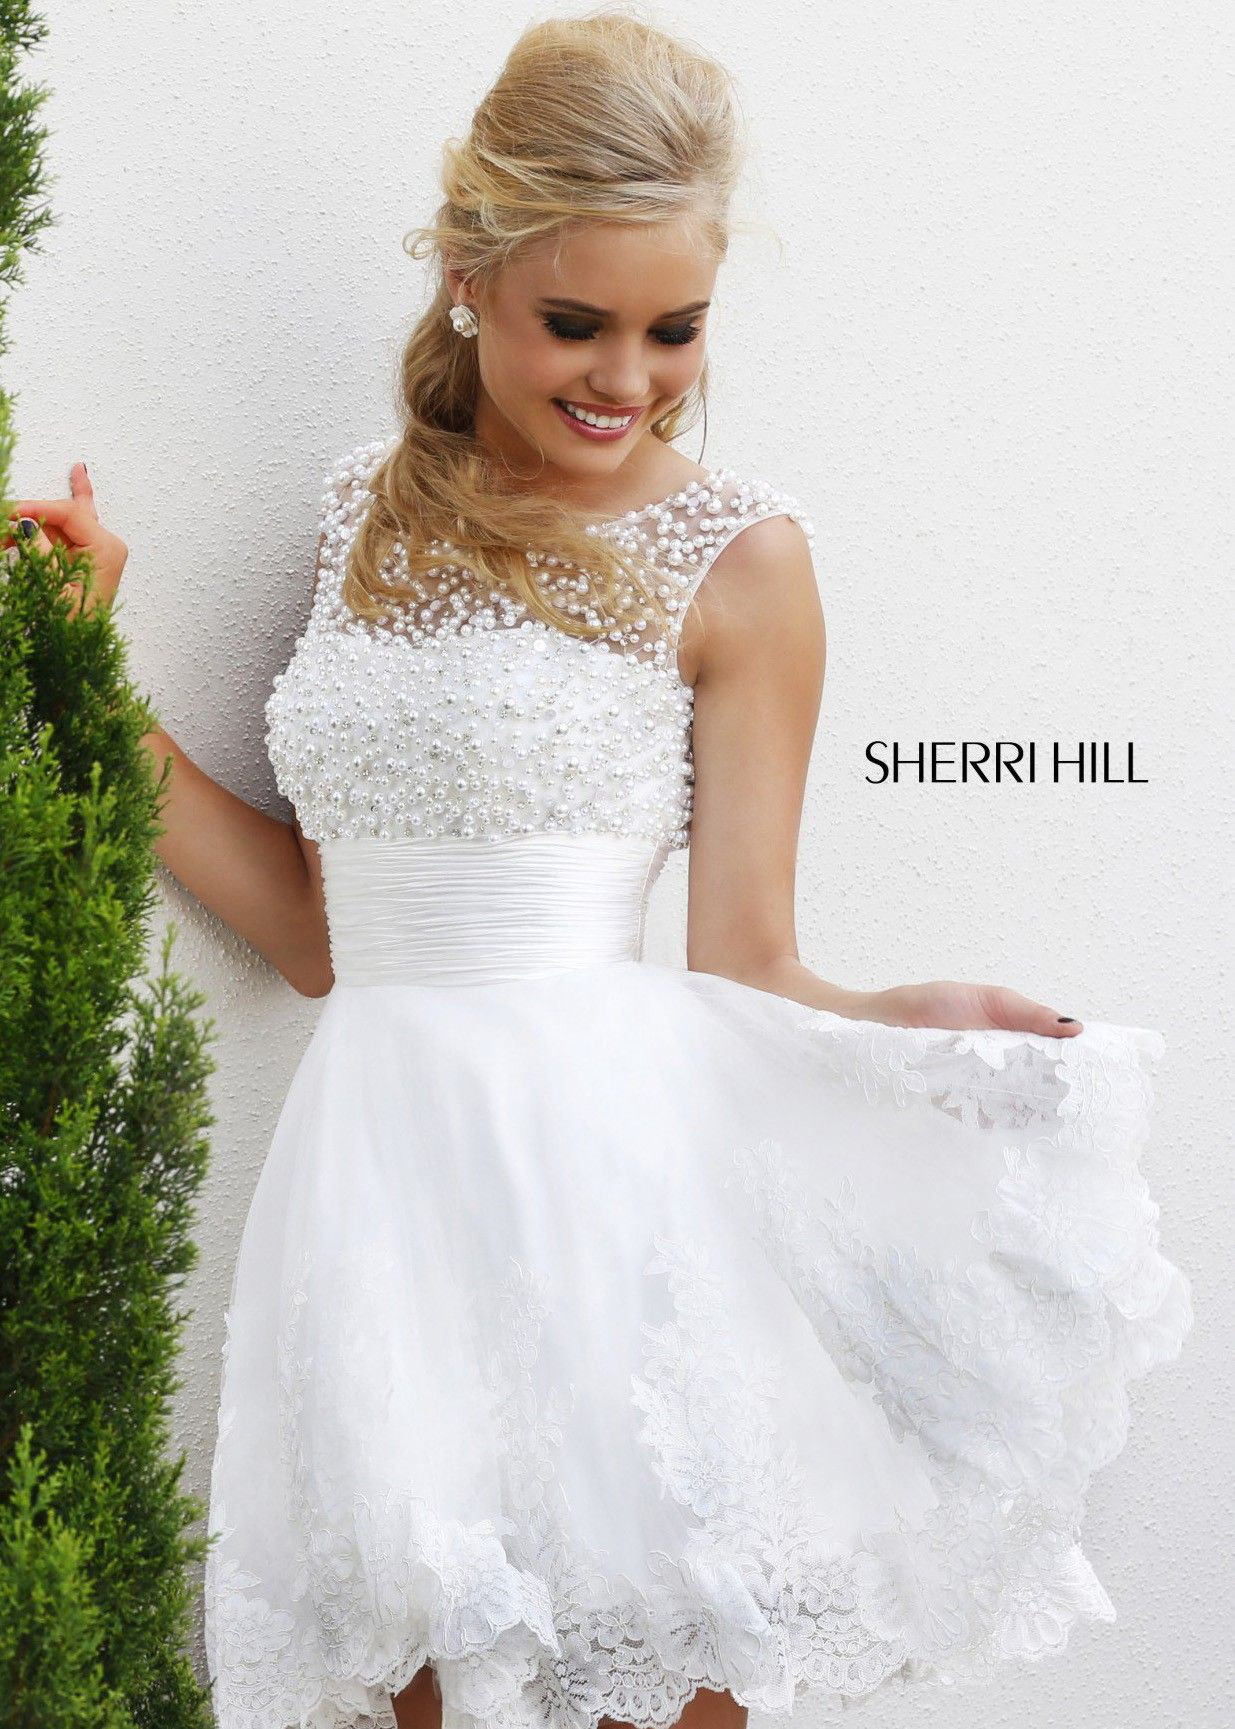 Sherri hill white beaded party dress reception dress white